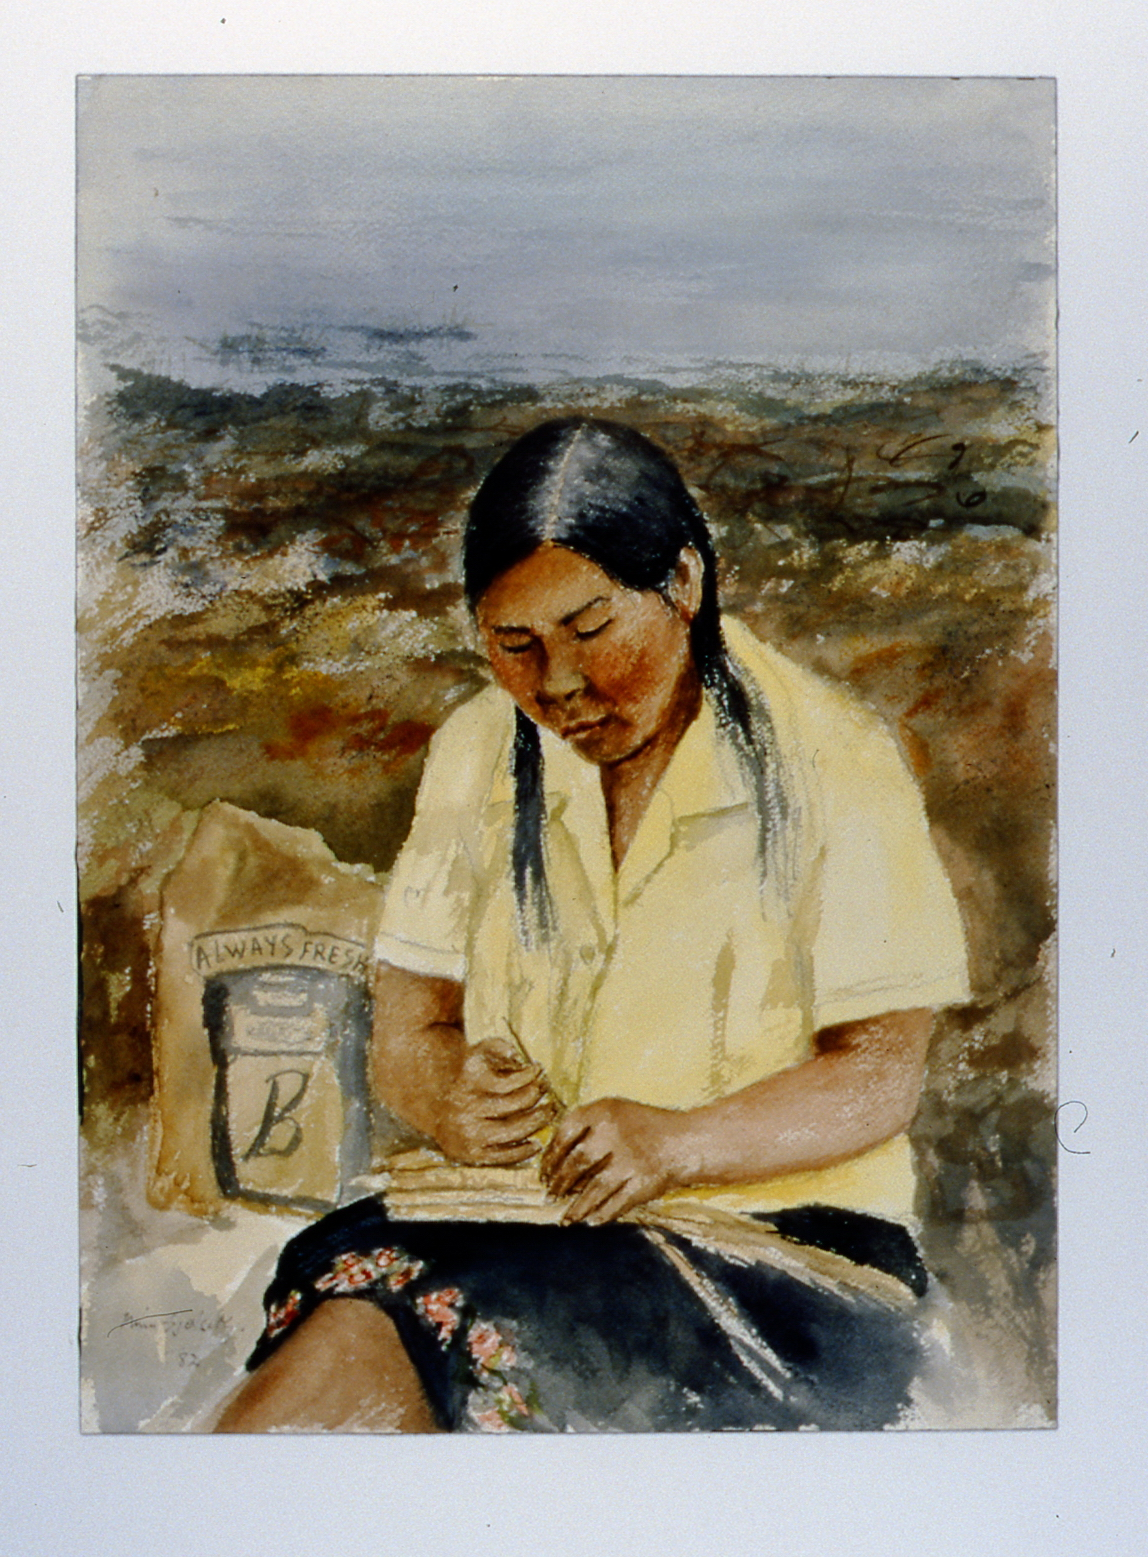 "Coppermine Basket Weaver , 1982, Minn Sjølseth, watercolour, 13 1/2"" x 9 1/2"", 2000.04.05, gift of Al and Laila Campbell"